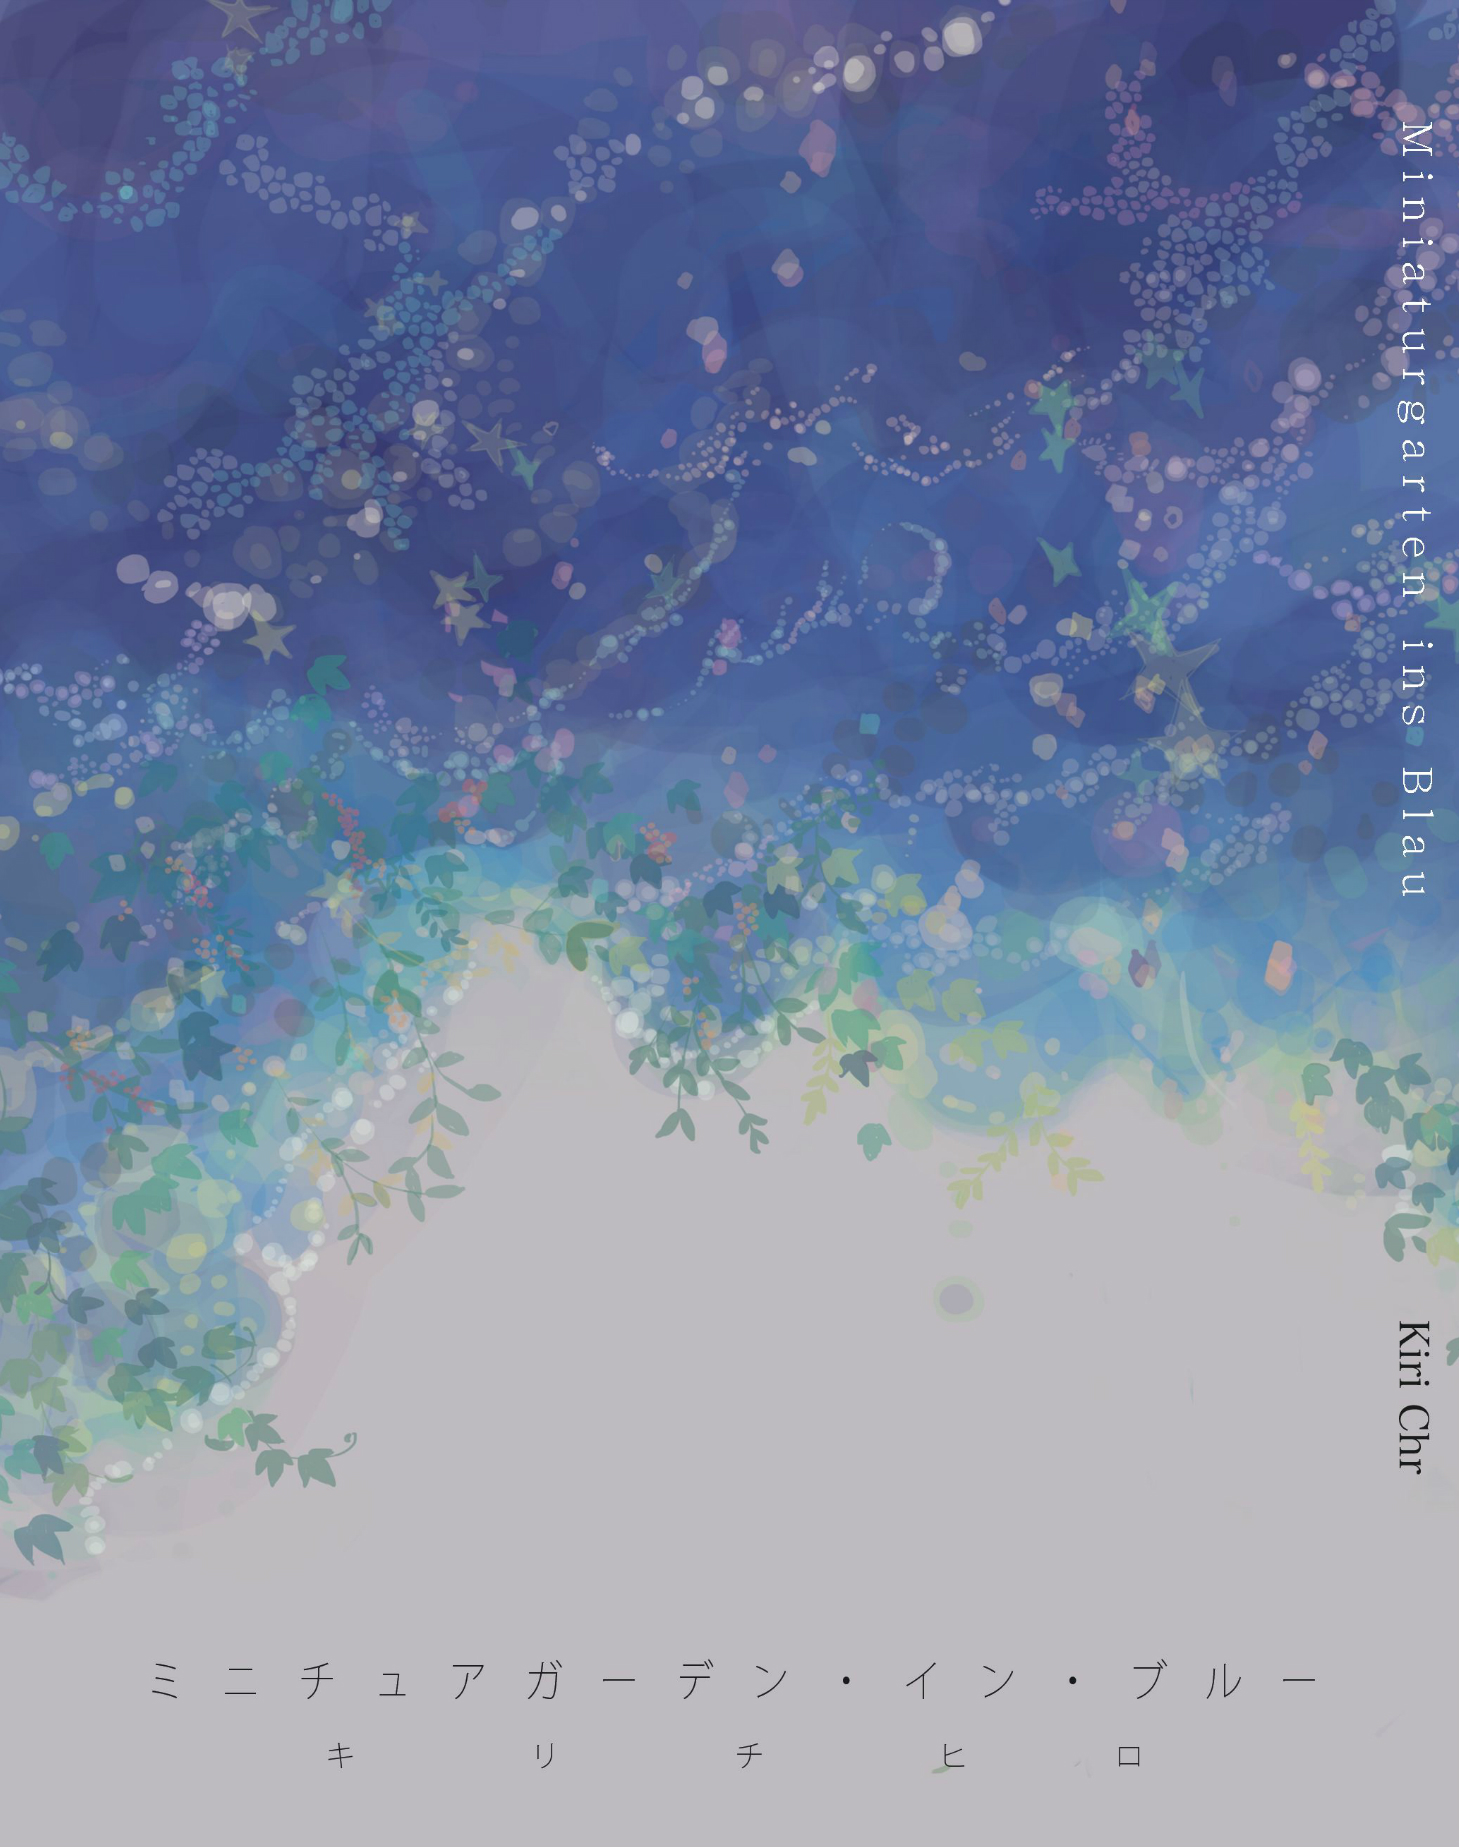 hyoshi_blue_1.jpg